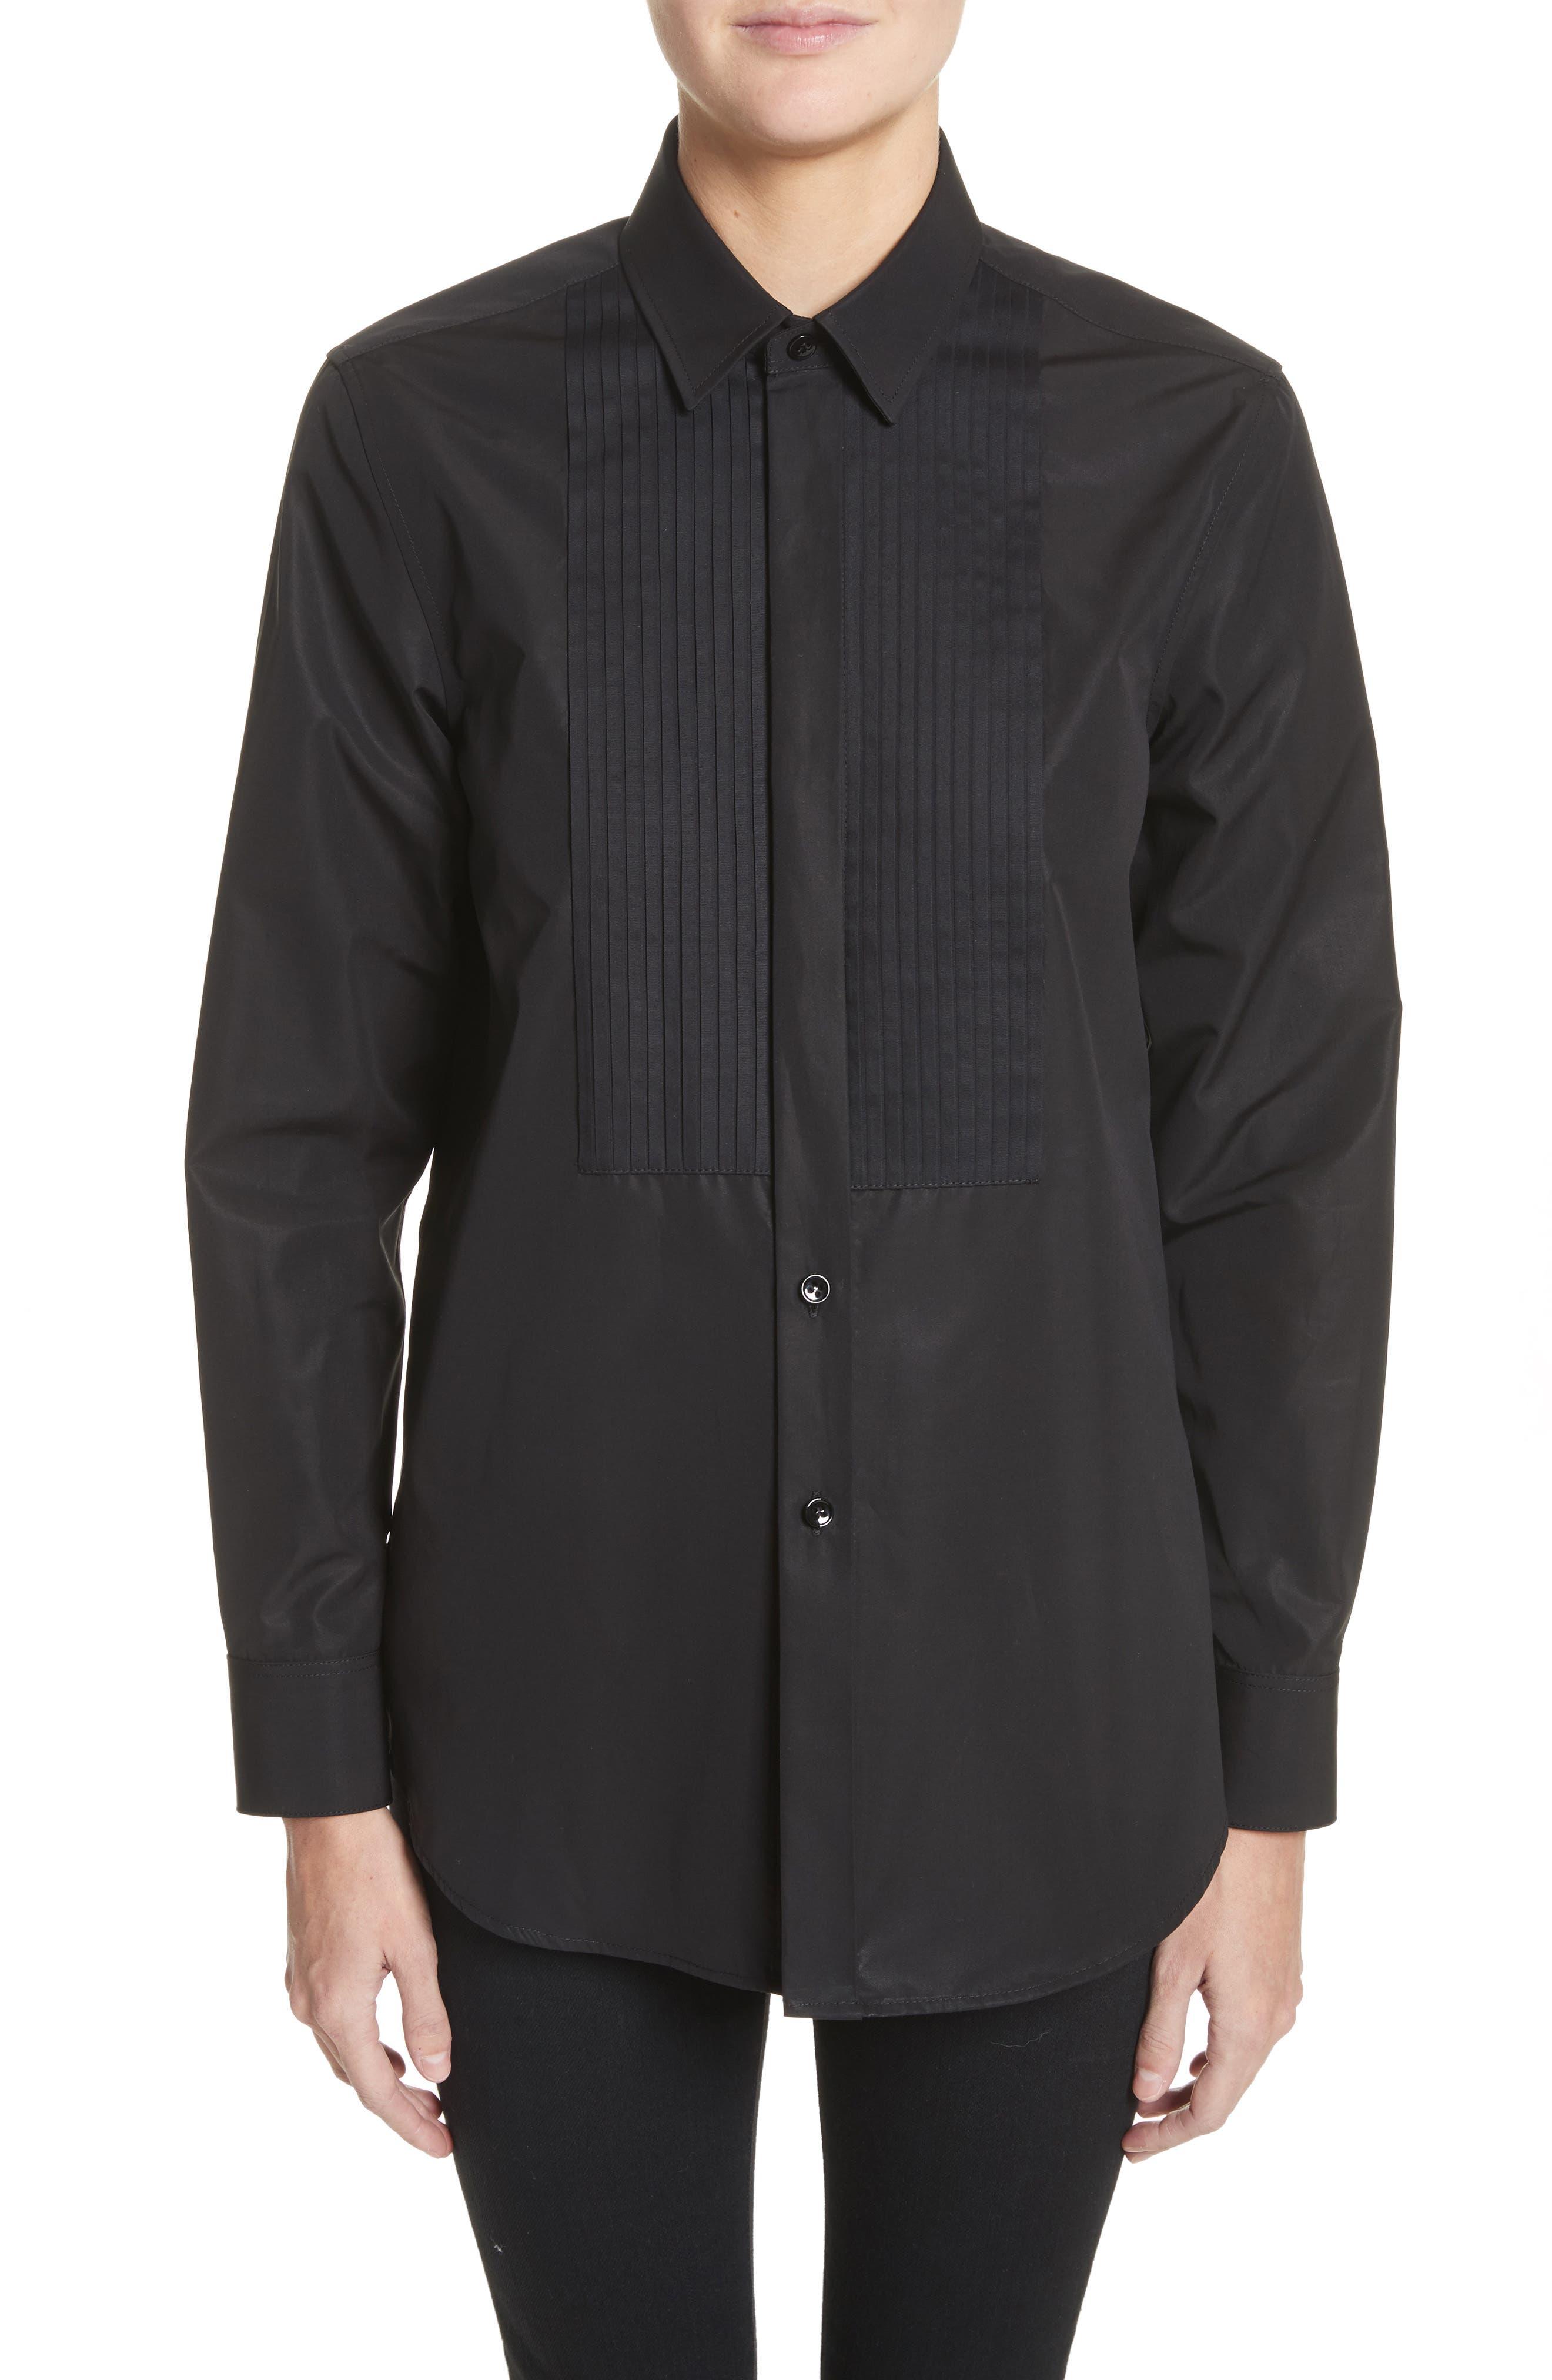 Alternate Image 1 Selected - Saint Laurent Cotton Tuxedo Shirt